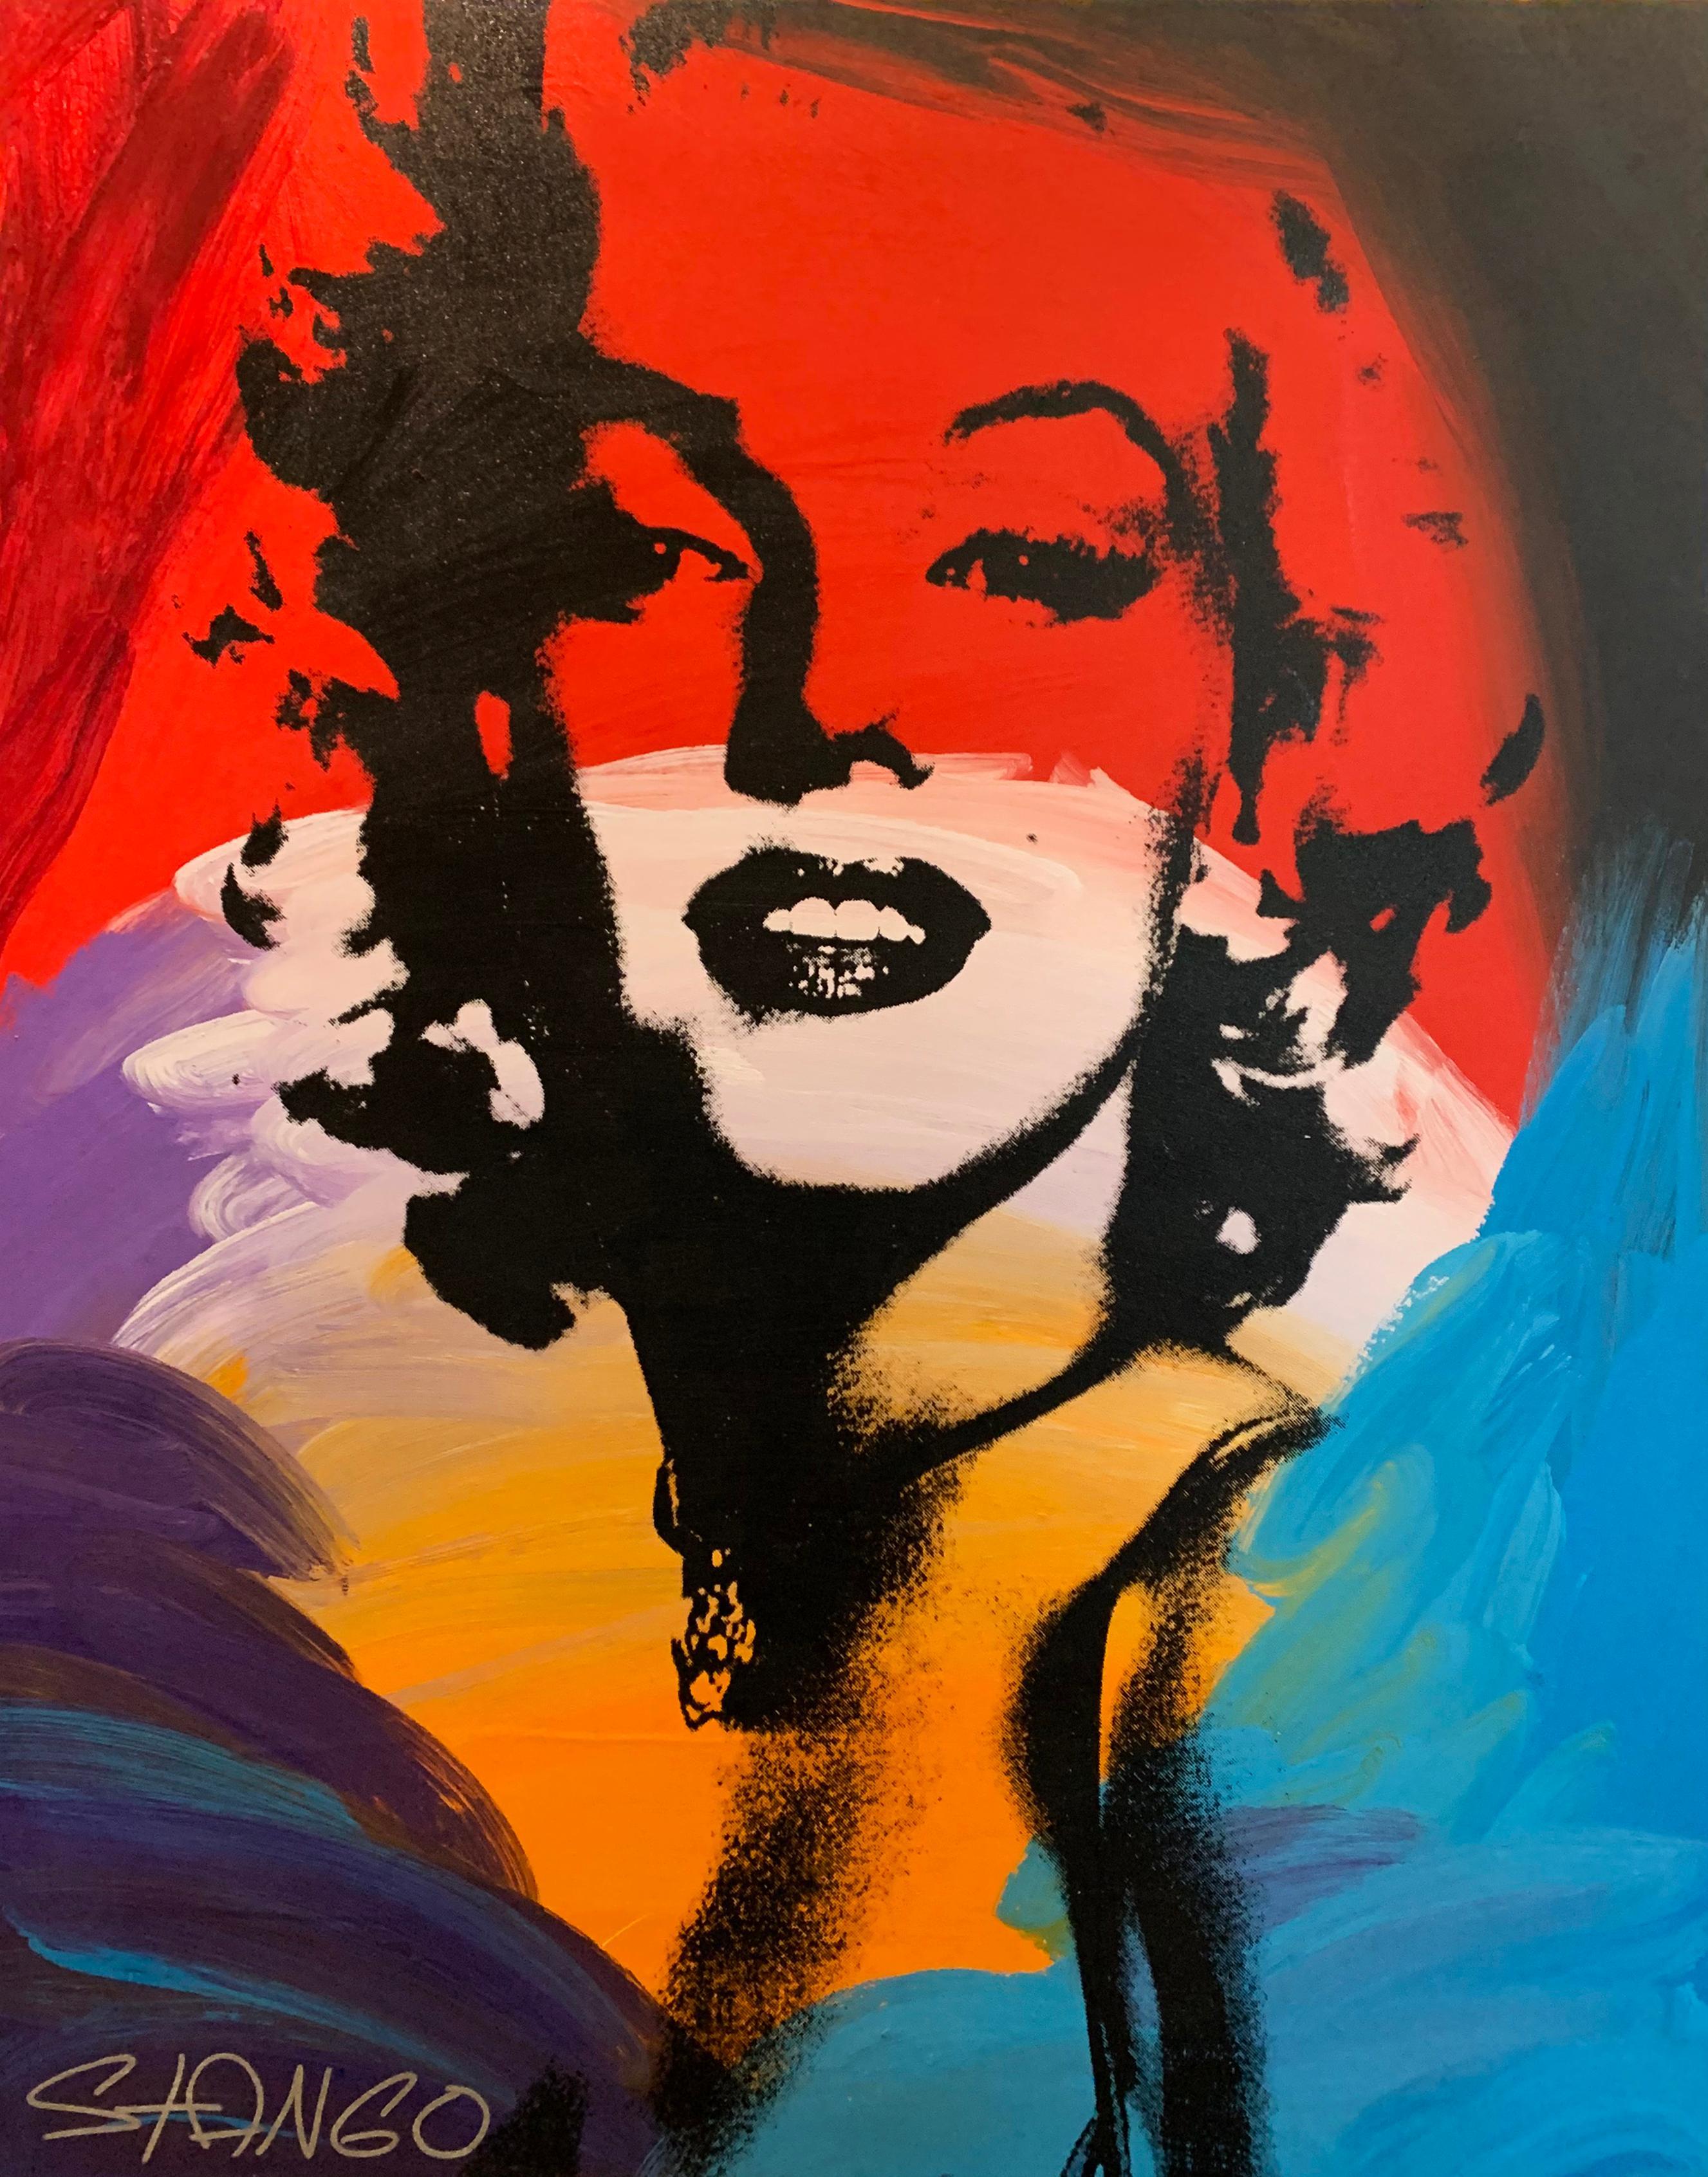 Marilyn, Pop Art Portrait of Marilyn Monroe, Acrylic on Canvas, Signed